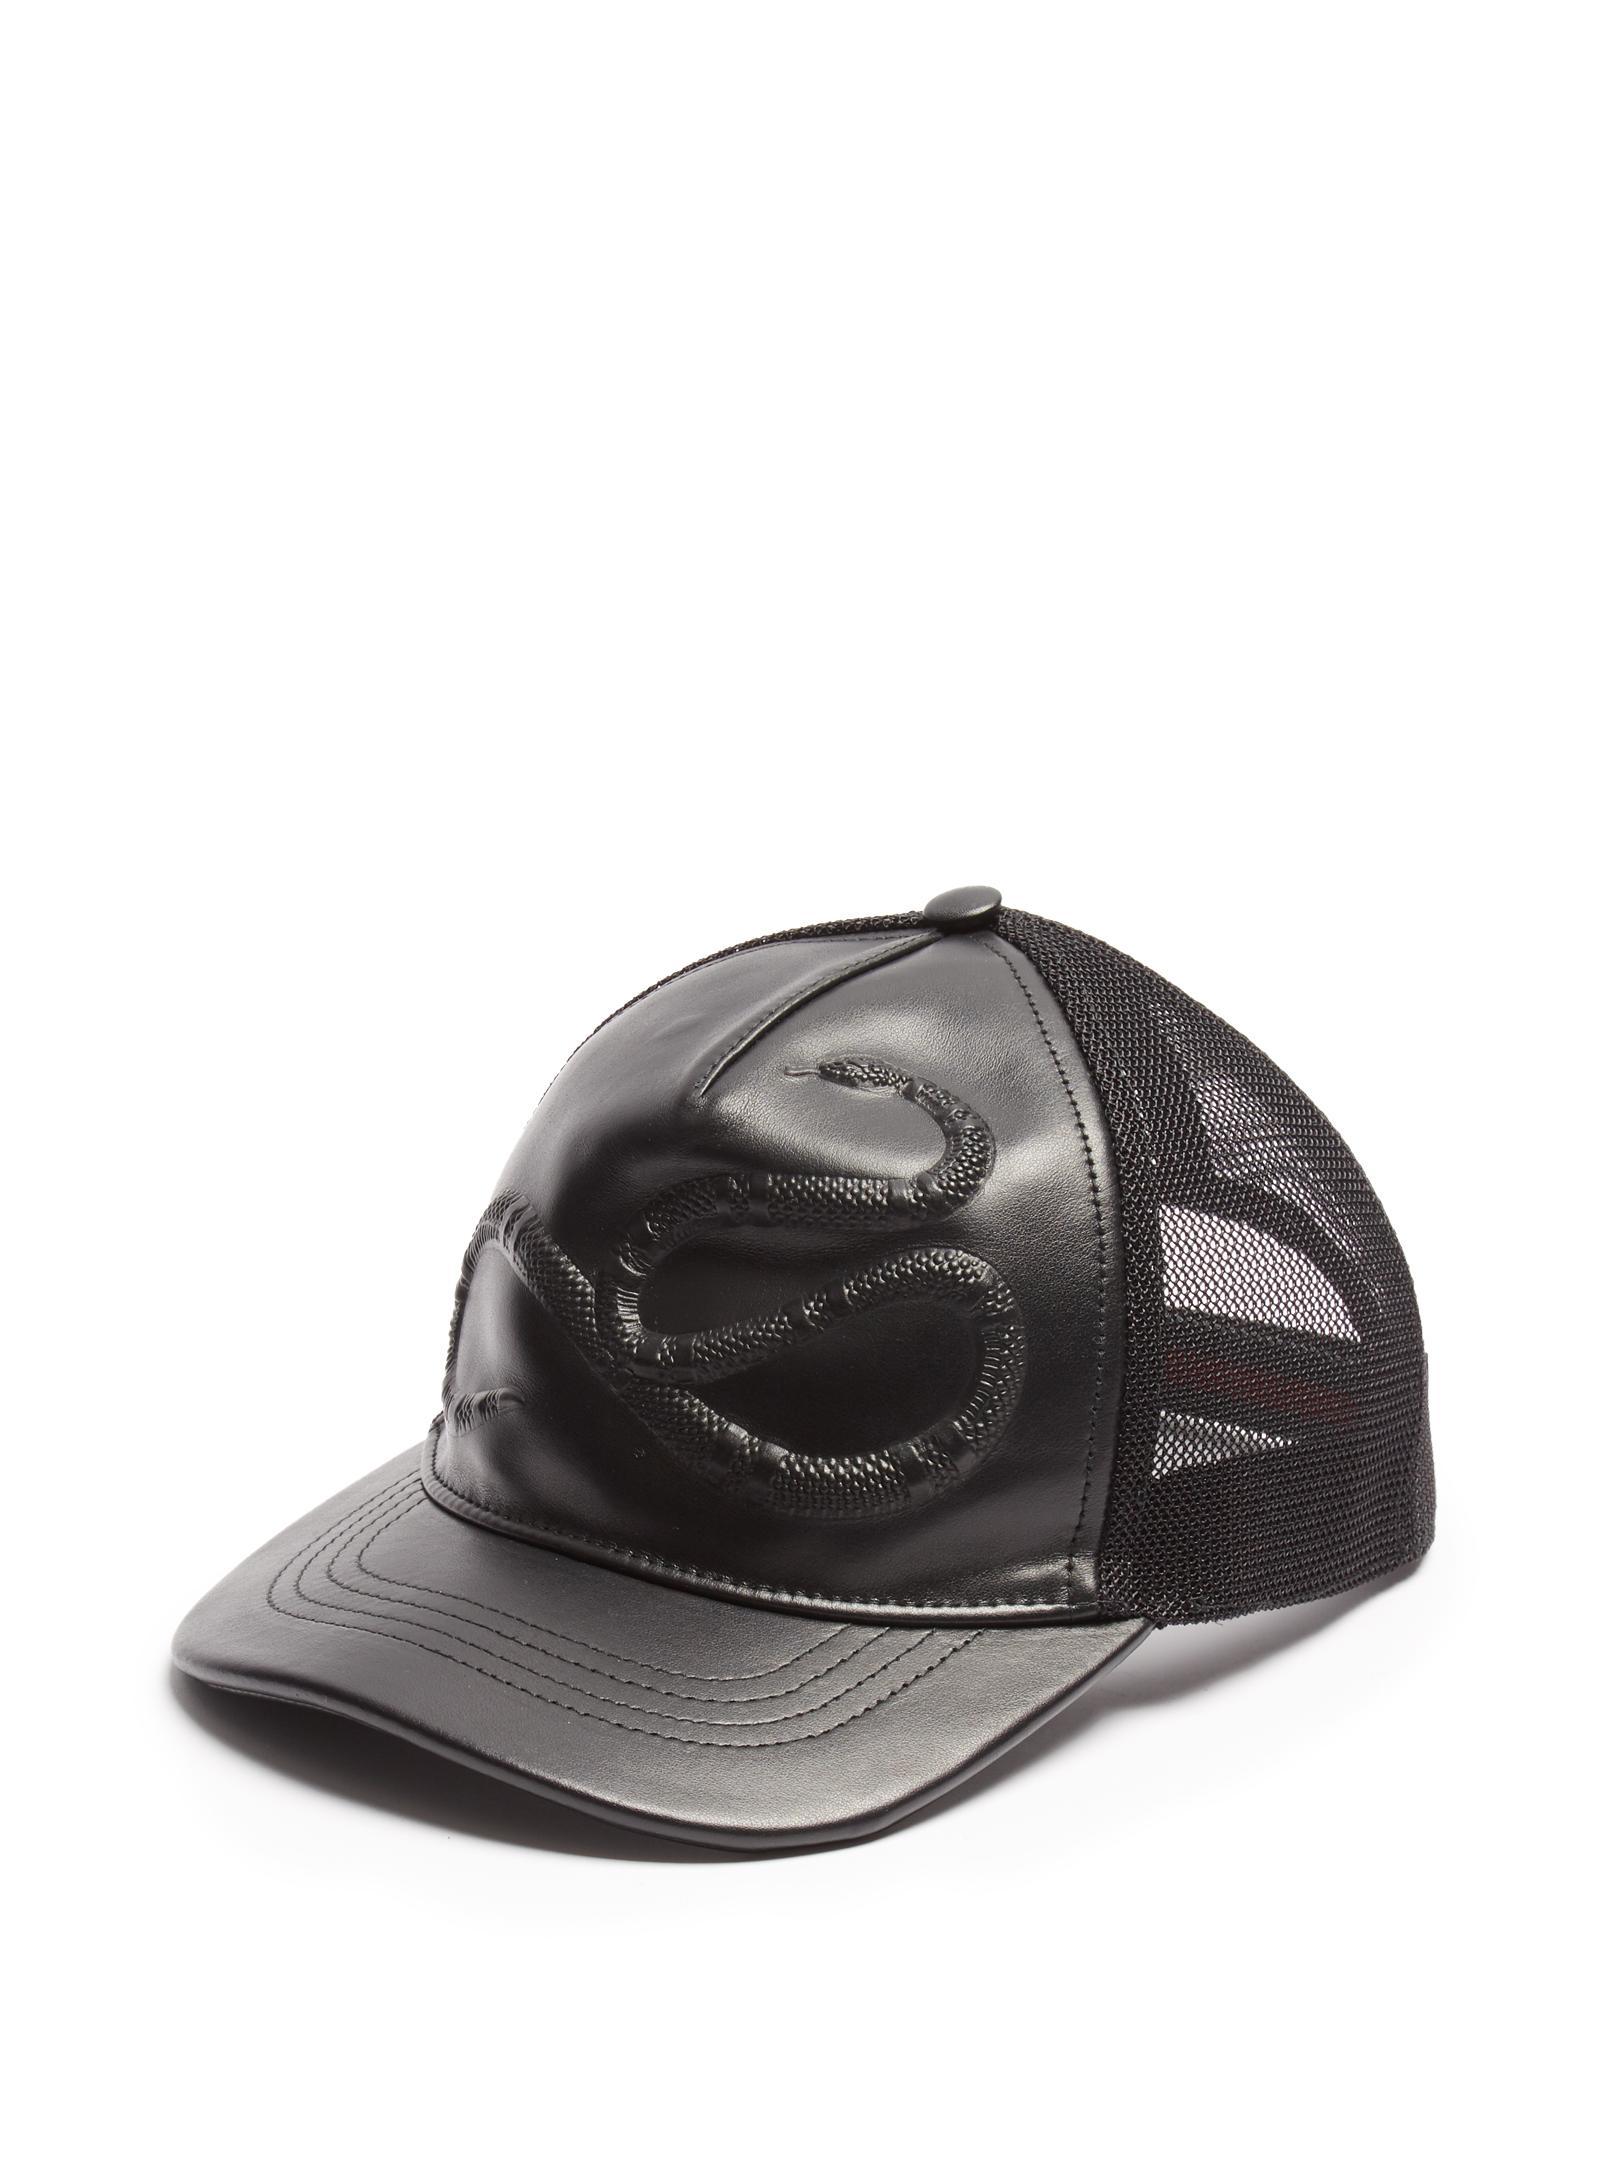 4025f734b54 Lyst - Gucci Snake-embossed Leather Baseball Cap in Black for Men